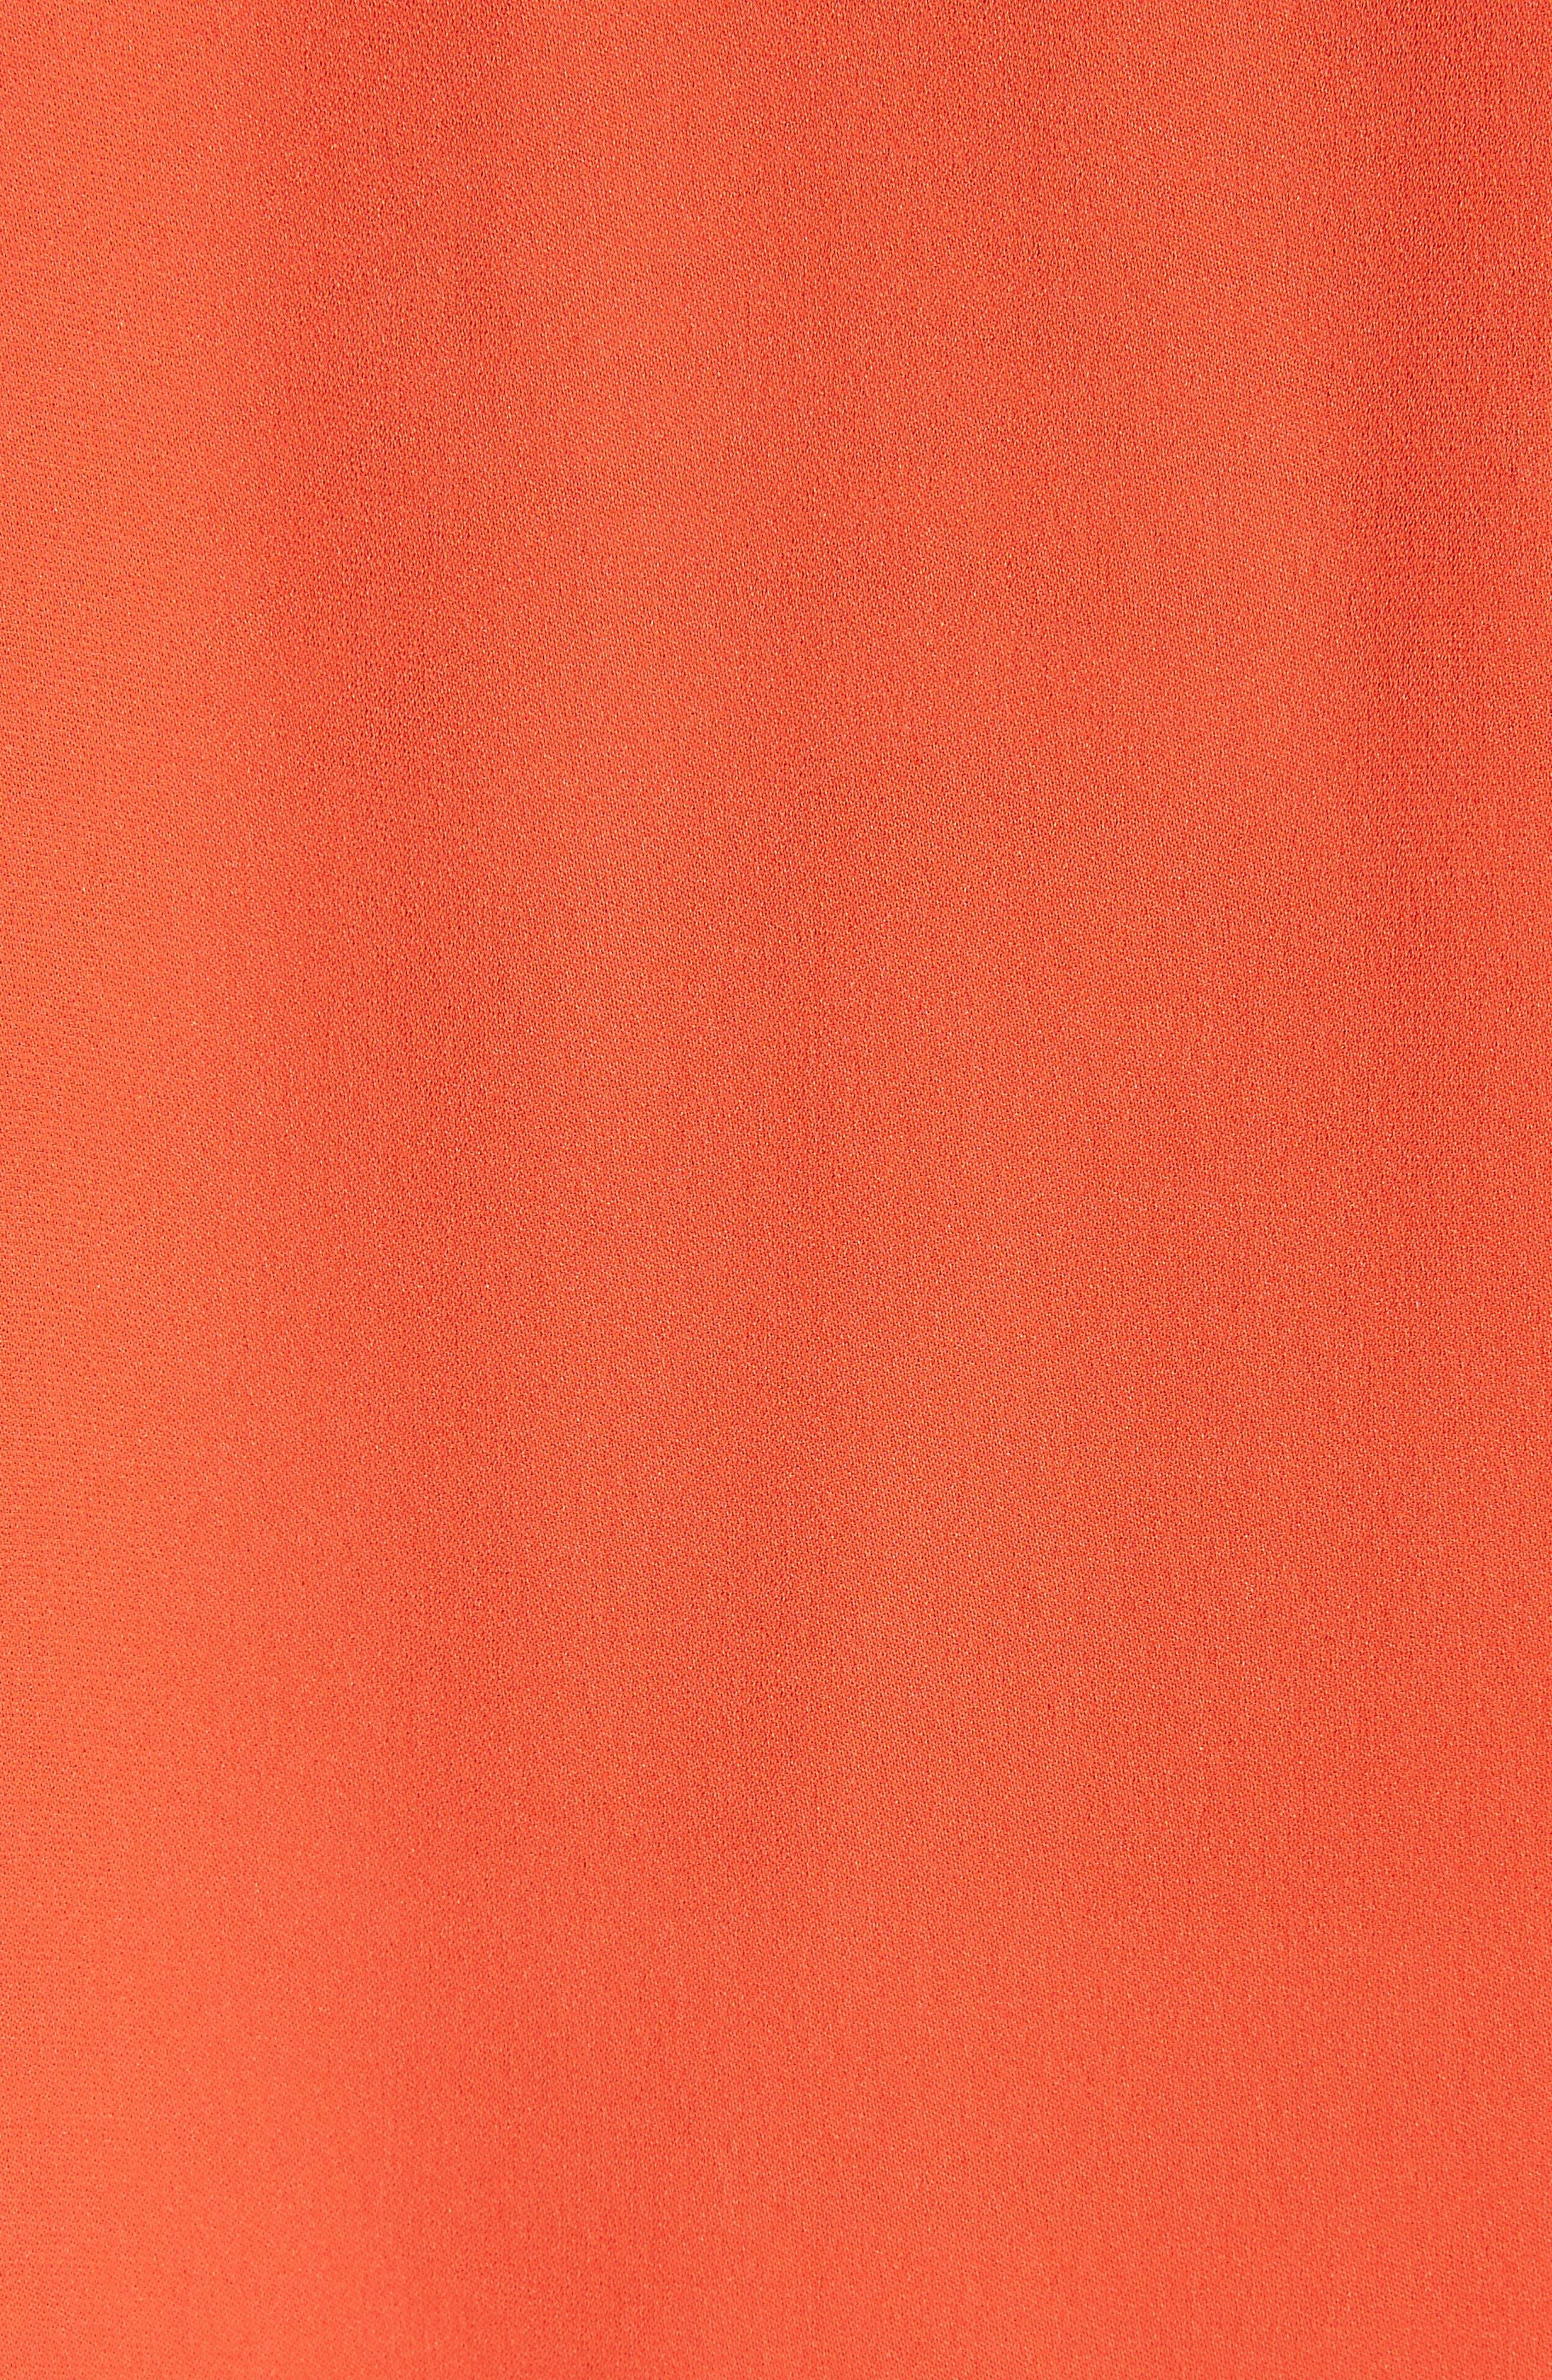 Oceae Silk Tank Top,                             Alternate thumbnail 5, color,                             Salsa